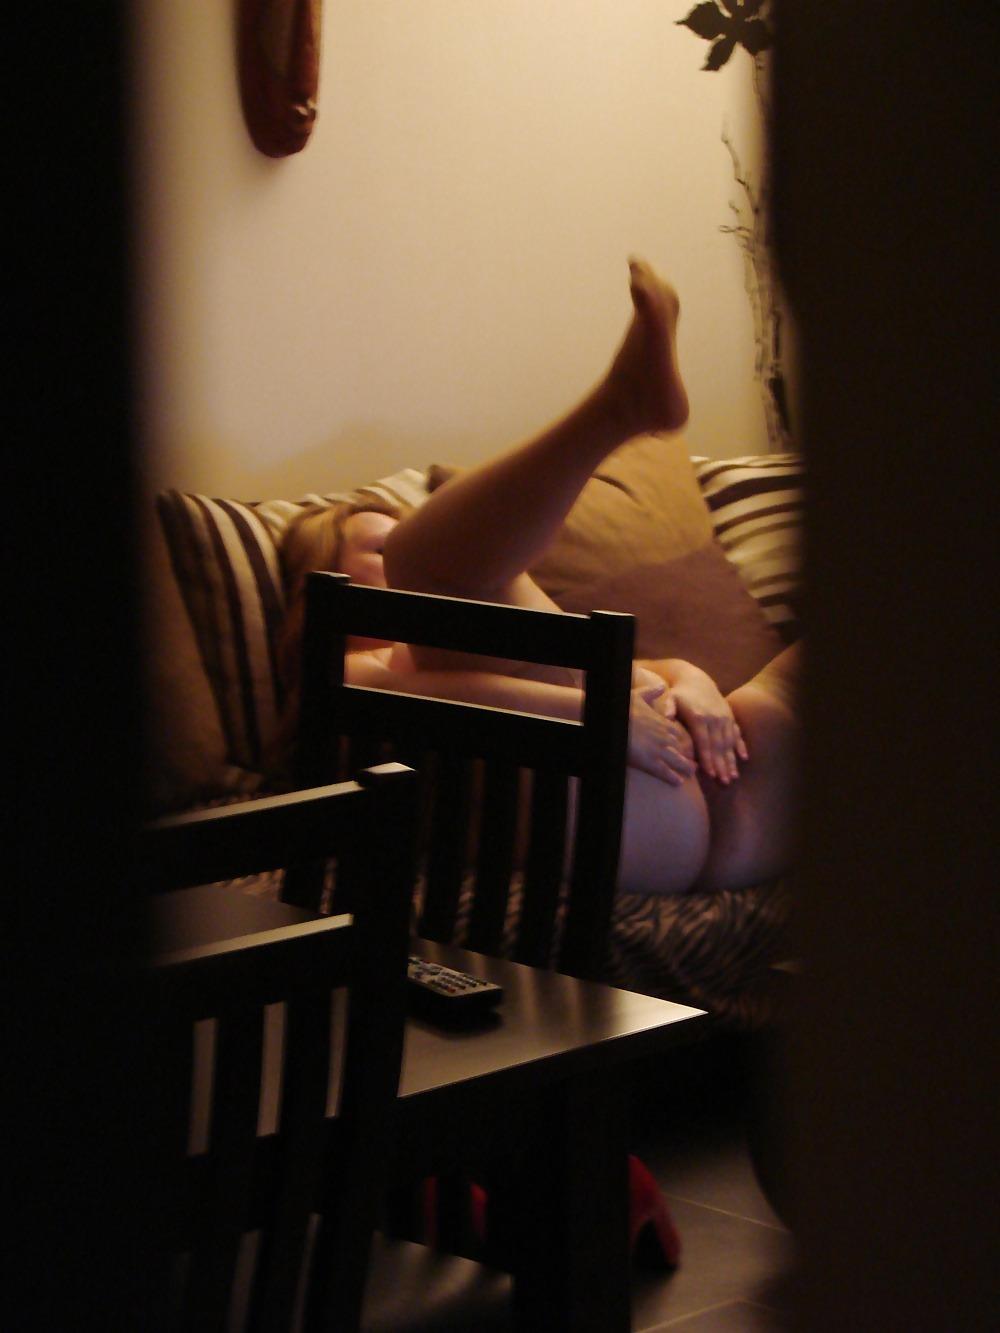 Masturbacion femenina casera sofa